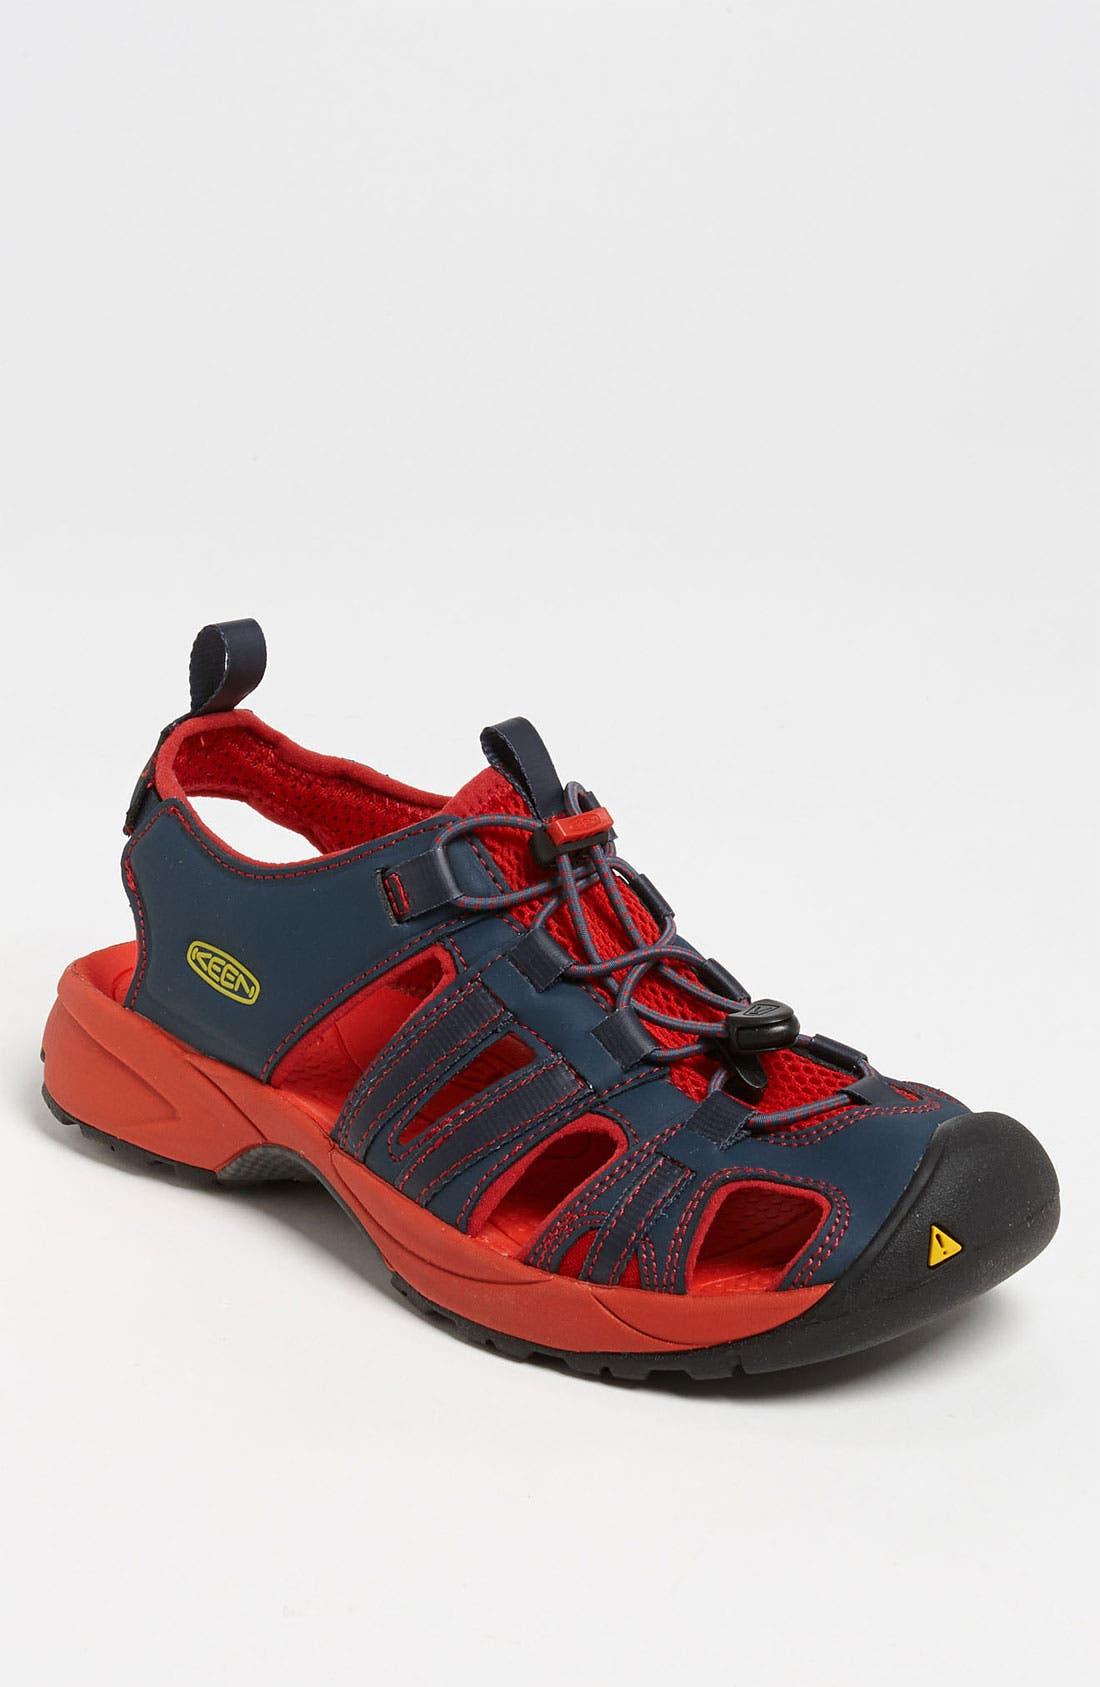 Main Image - Keen 'Turia' Sandal (Men)